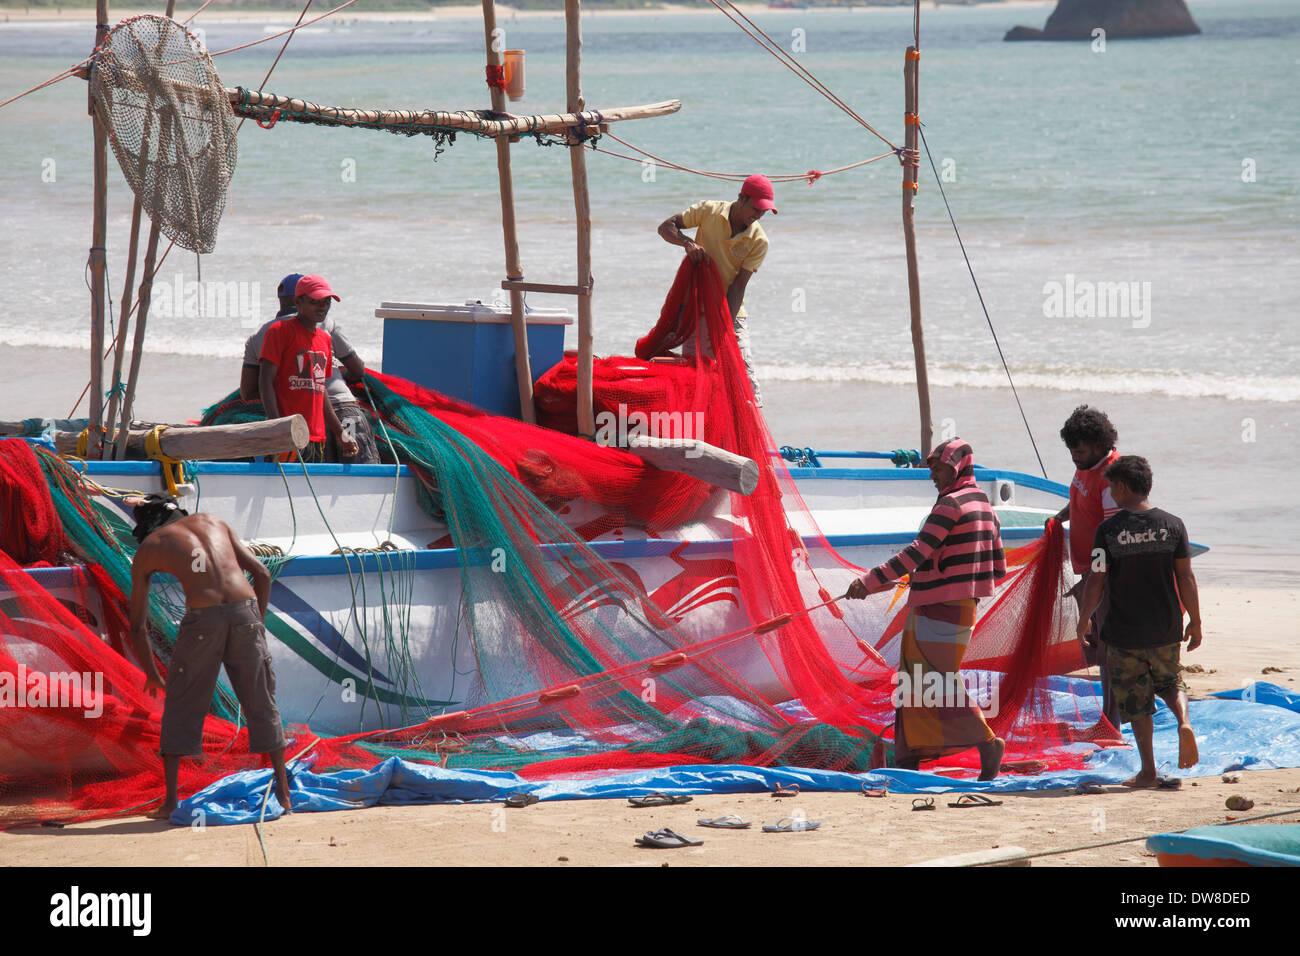 Sri Lanka, Weligama, fishermen plying their nets, - Stock Image